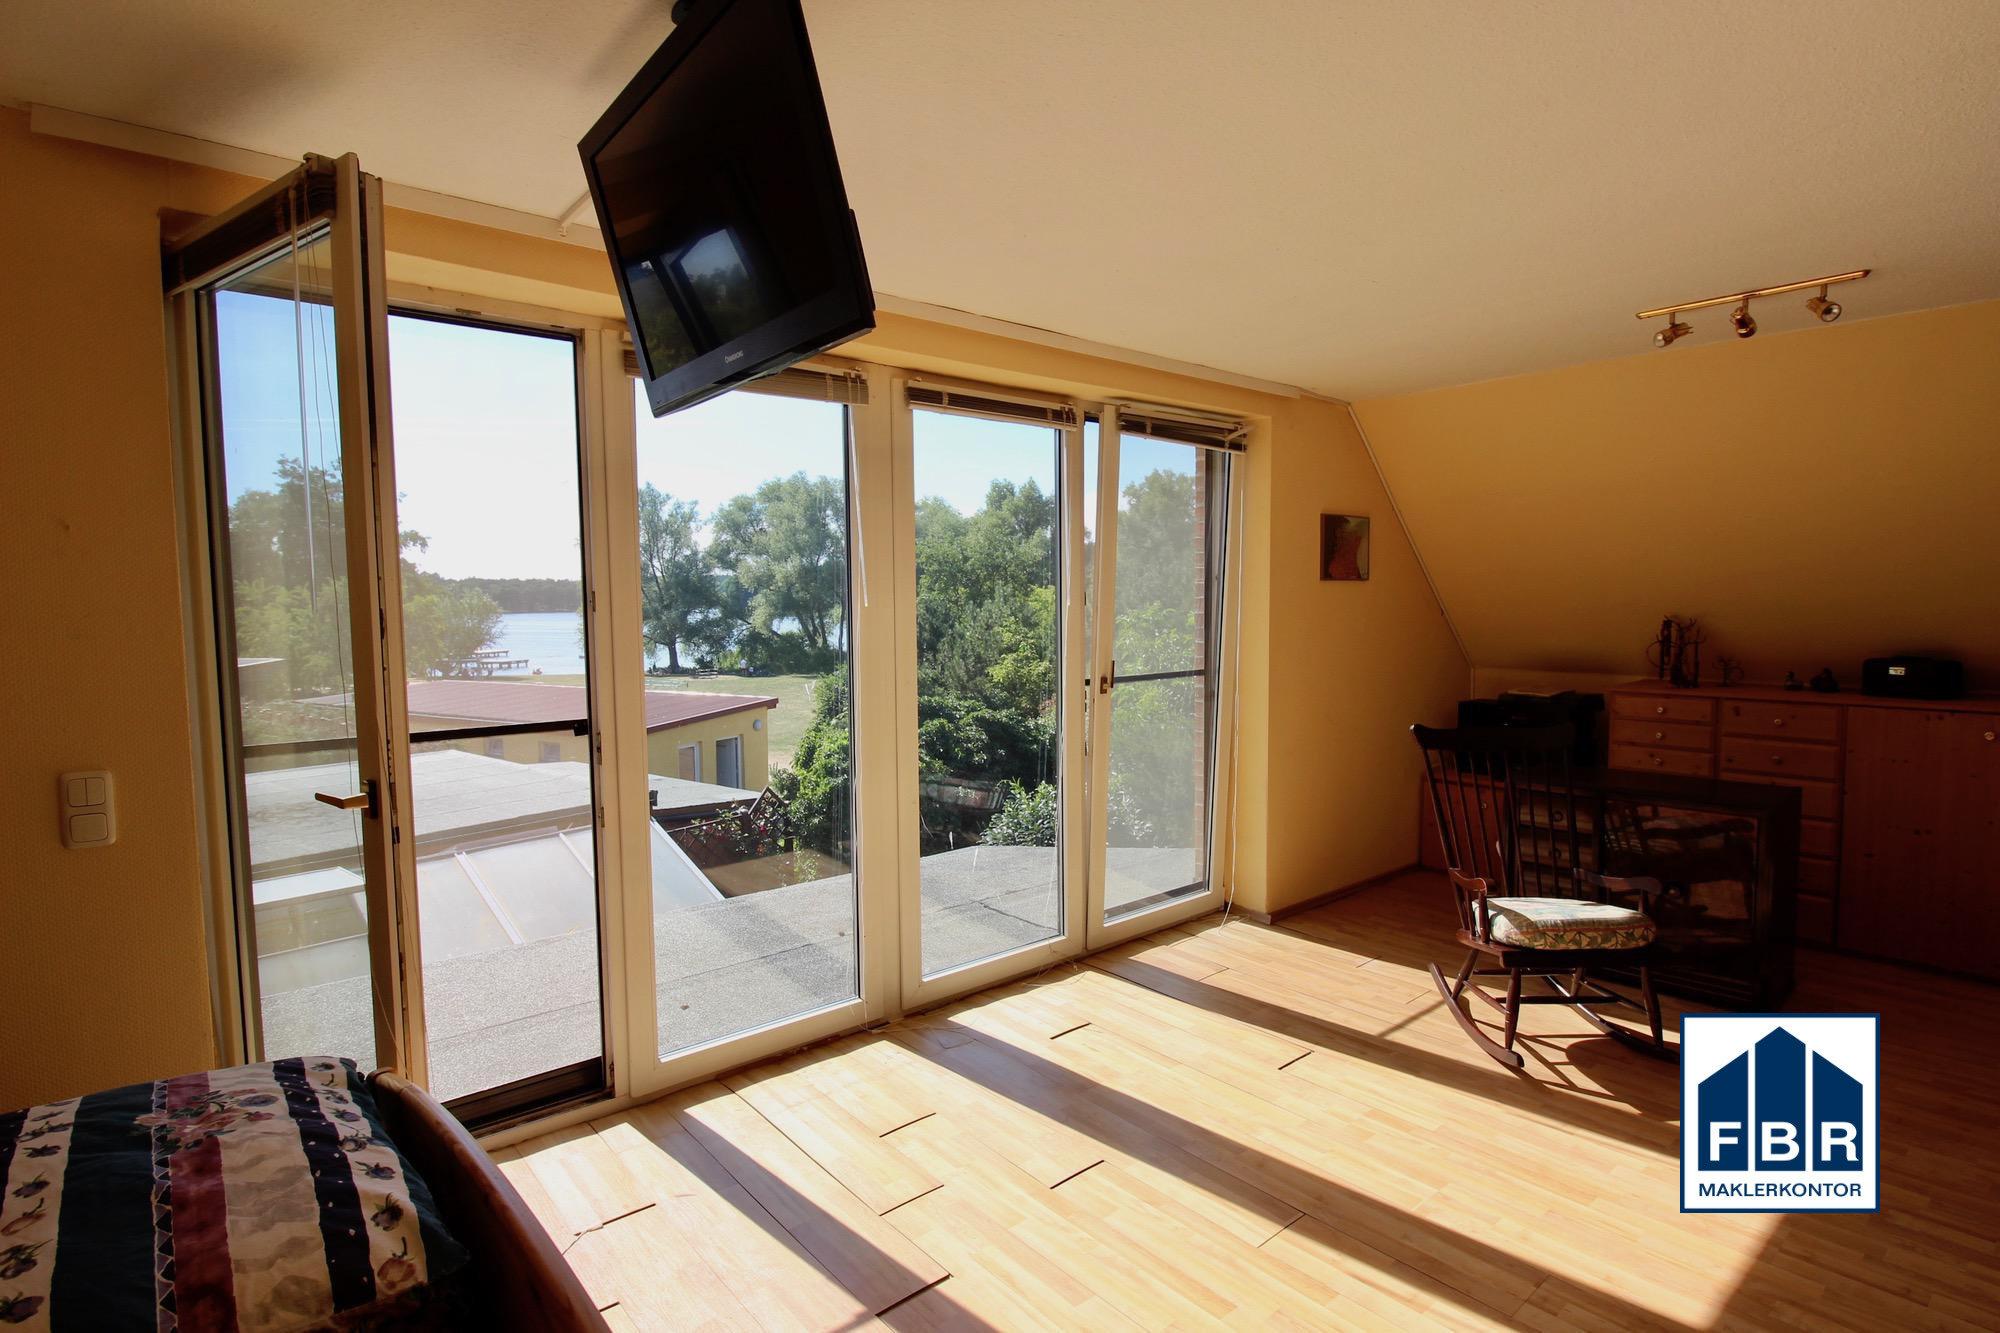 Schlafzimmer mit Seeblick im Dachgeschoss